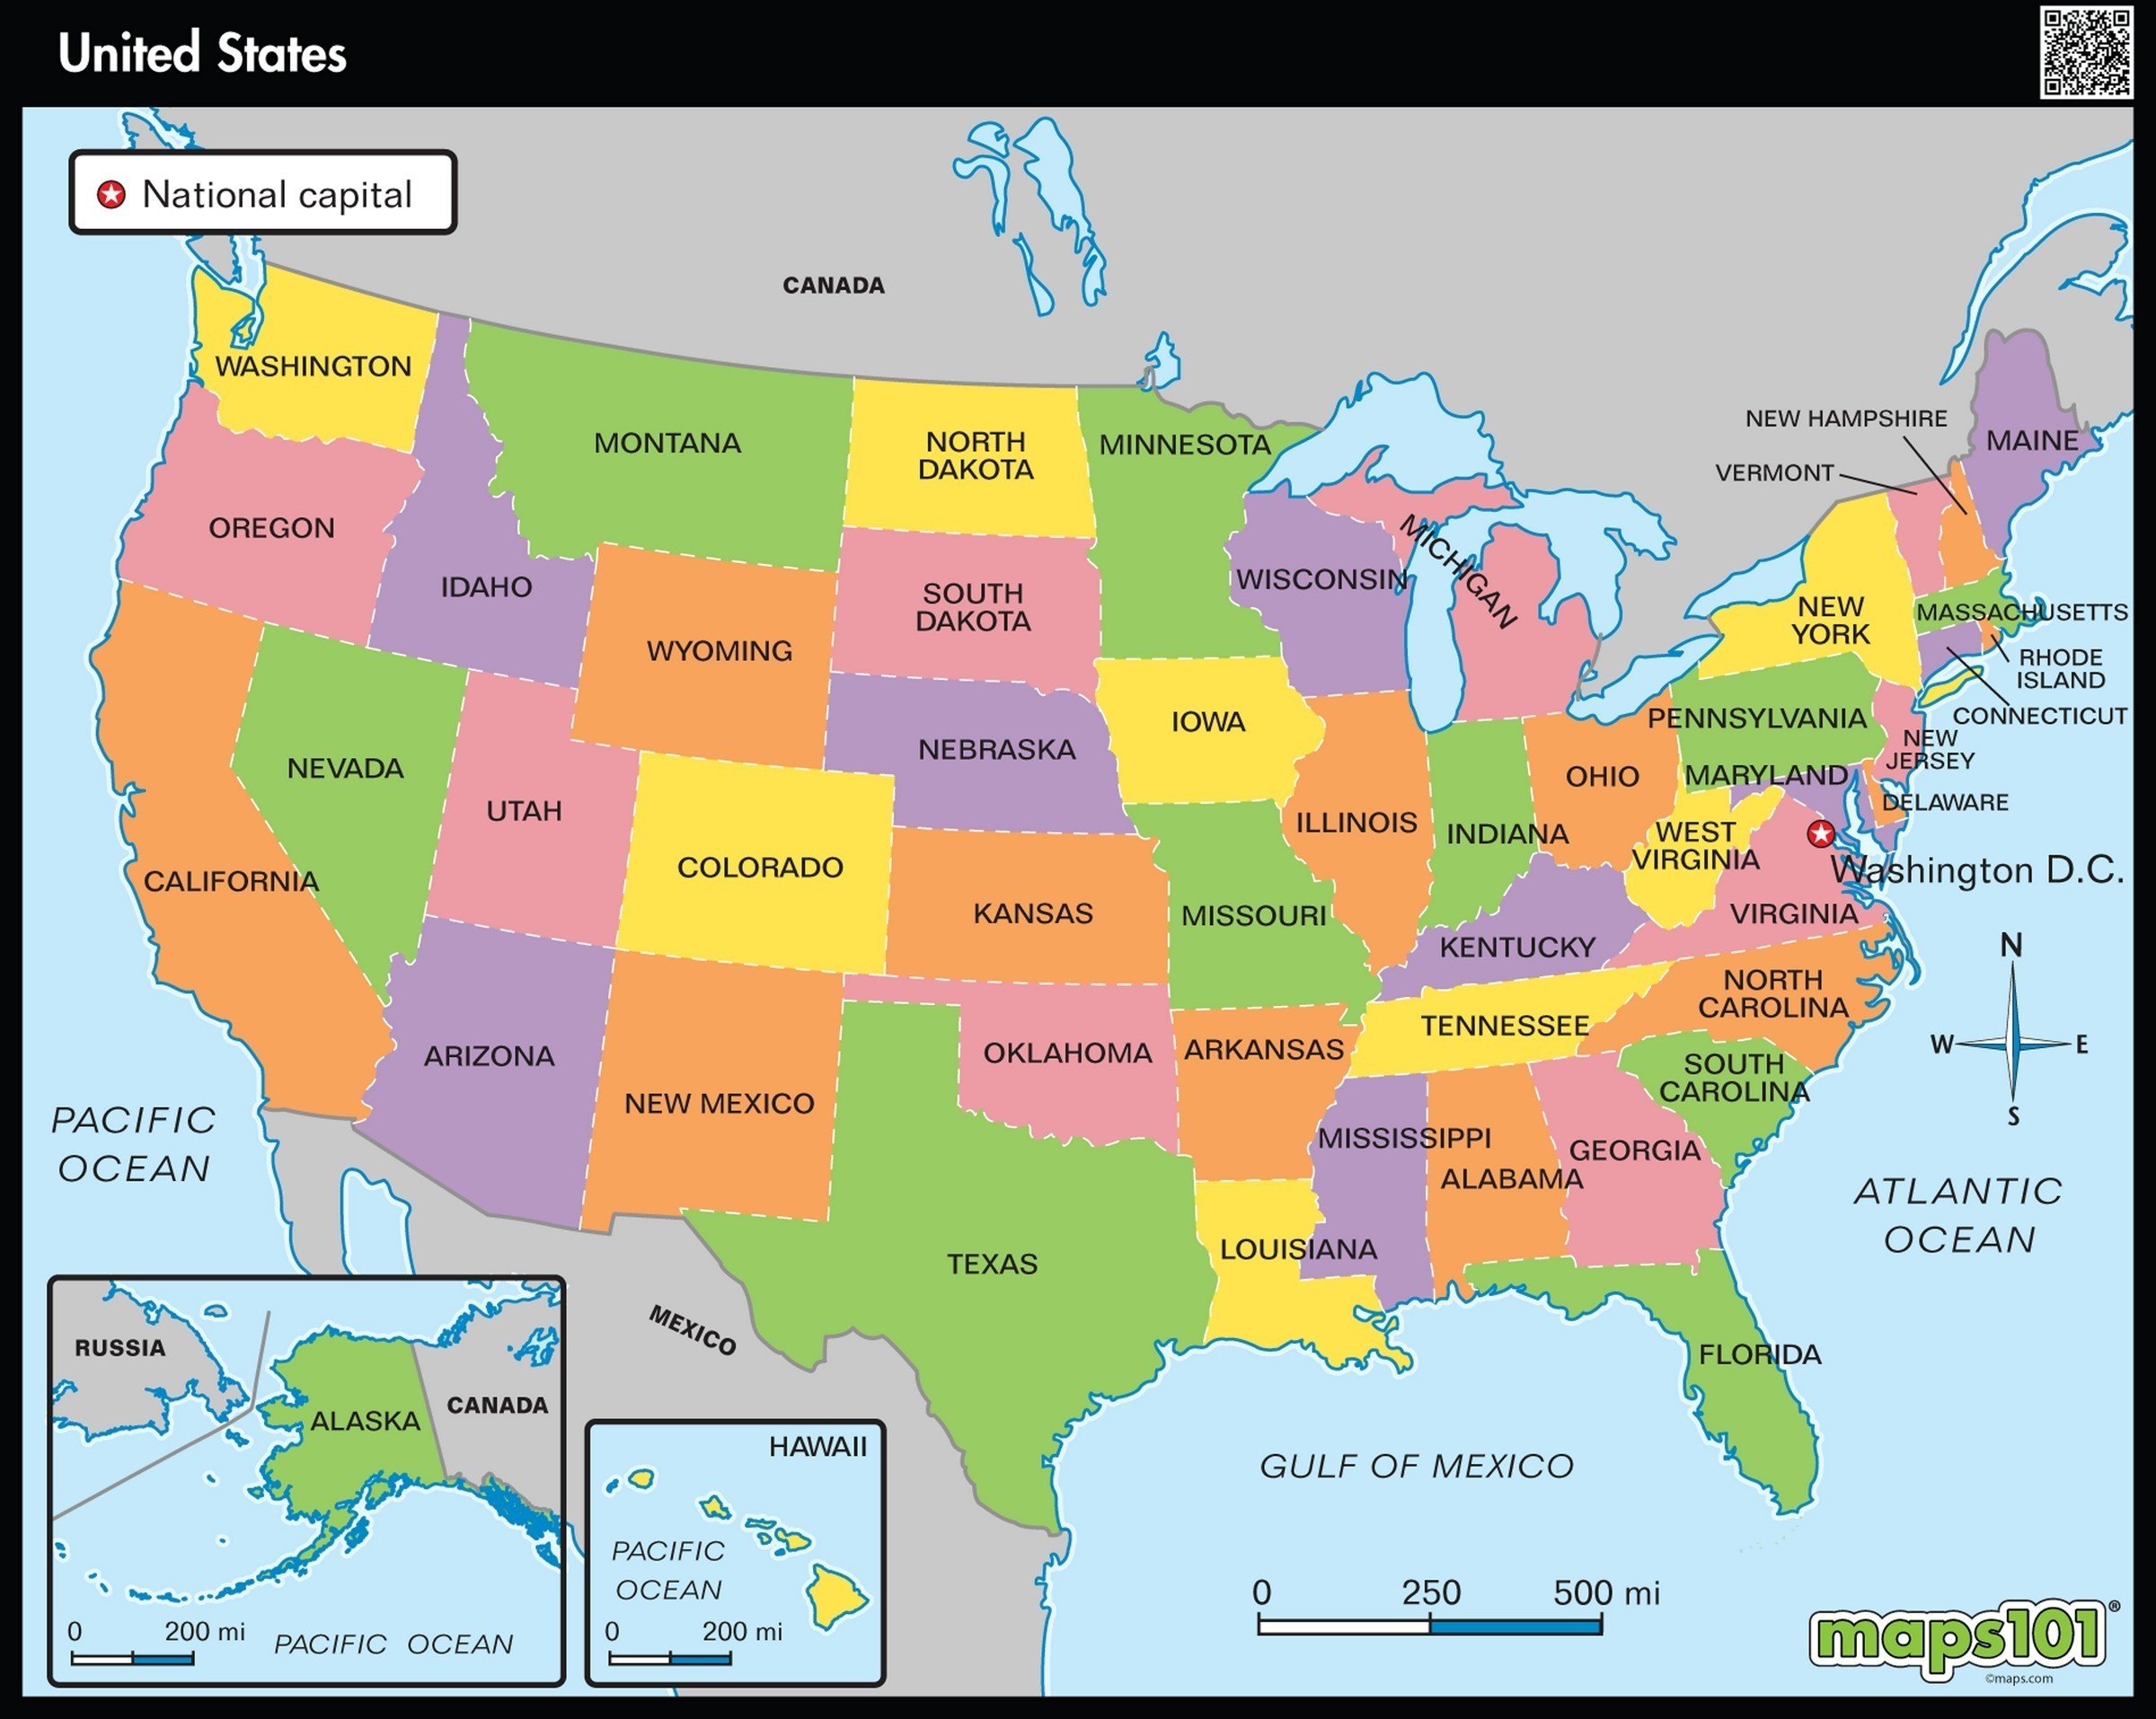 Naples Florida Us Map Refrence United States Map Naples Florida - Show Me A Map Of Naples Florida